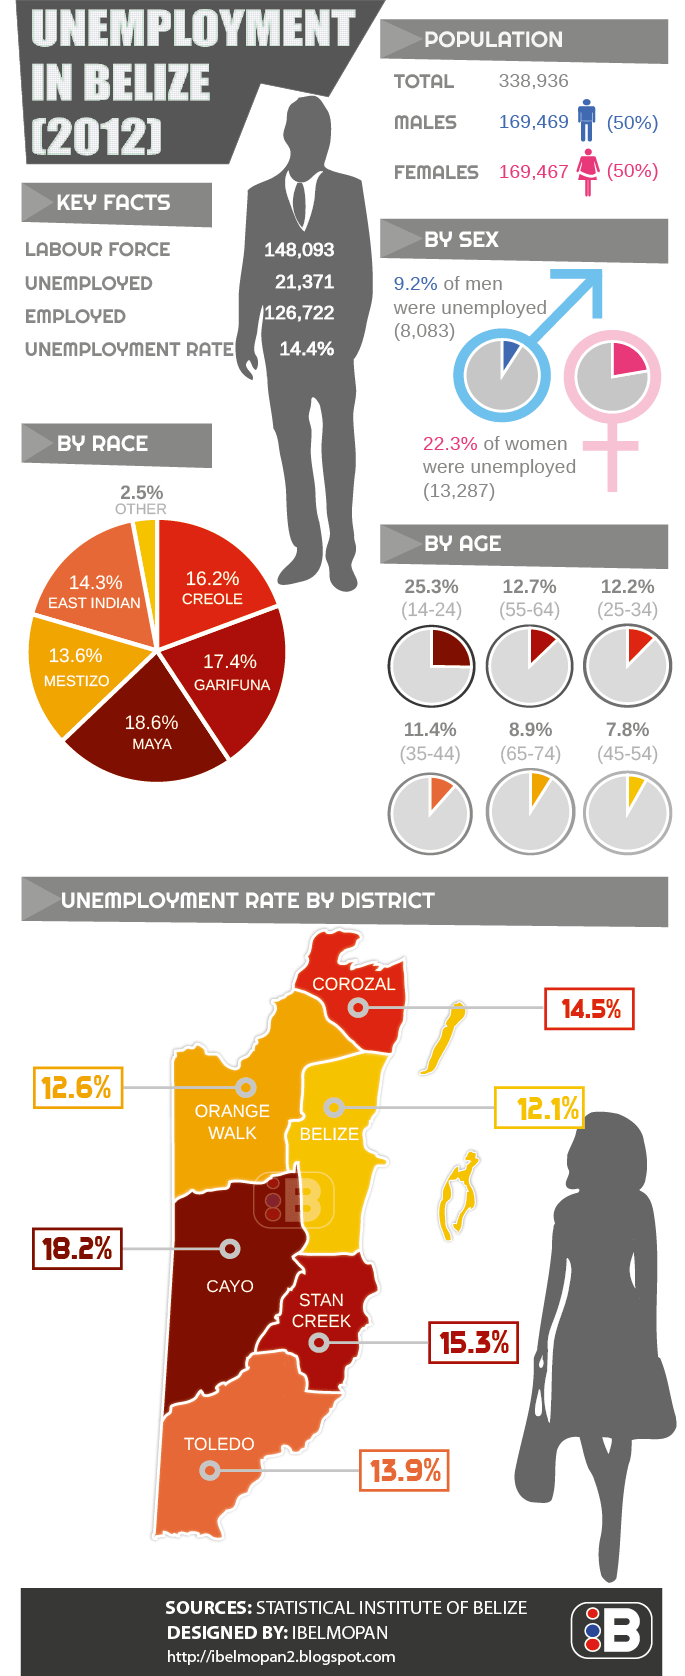 unemployment-in-belize-2012_504f769c3979f